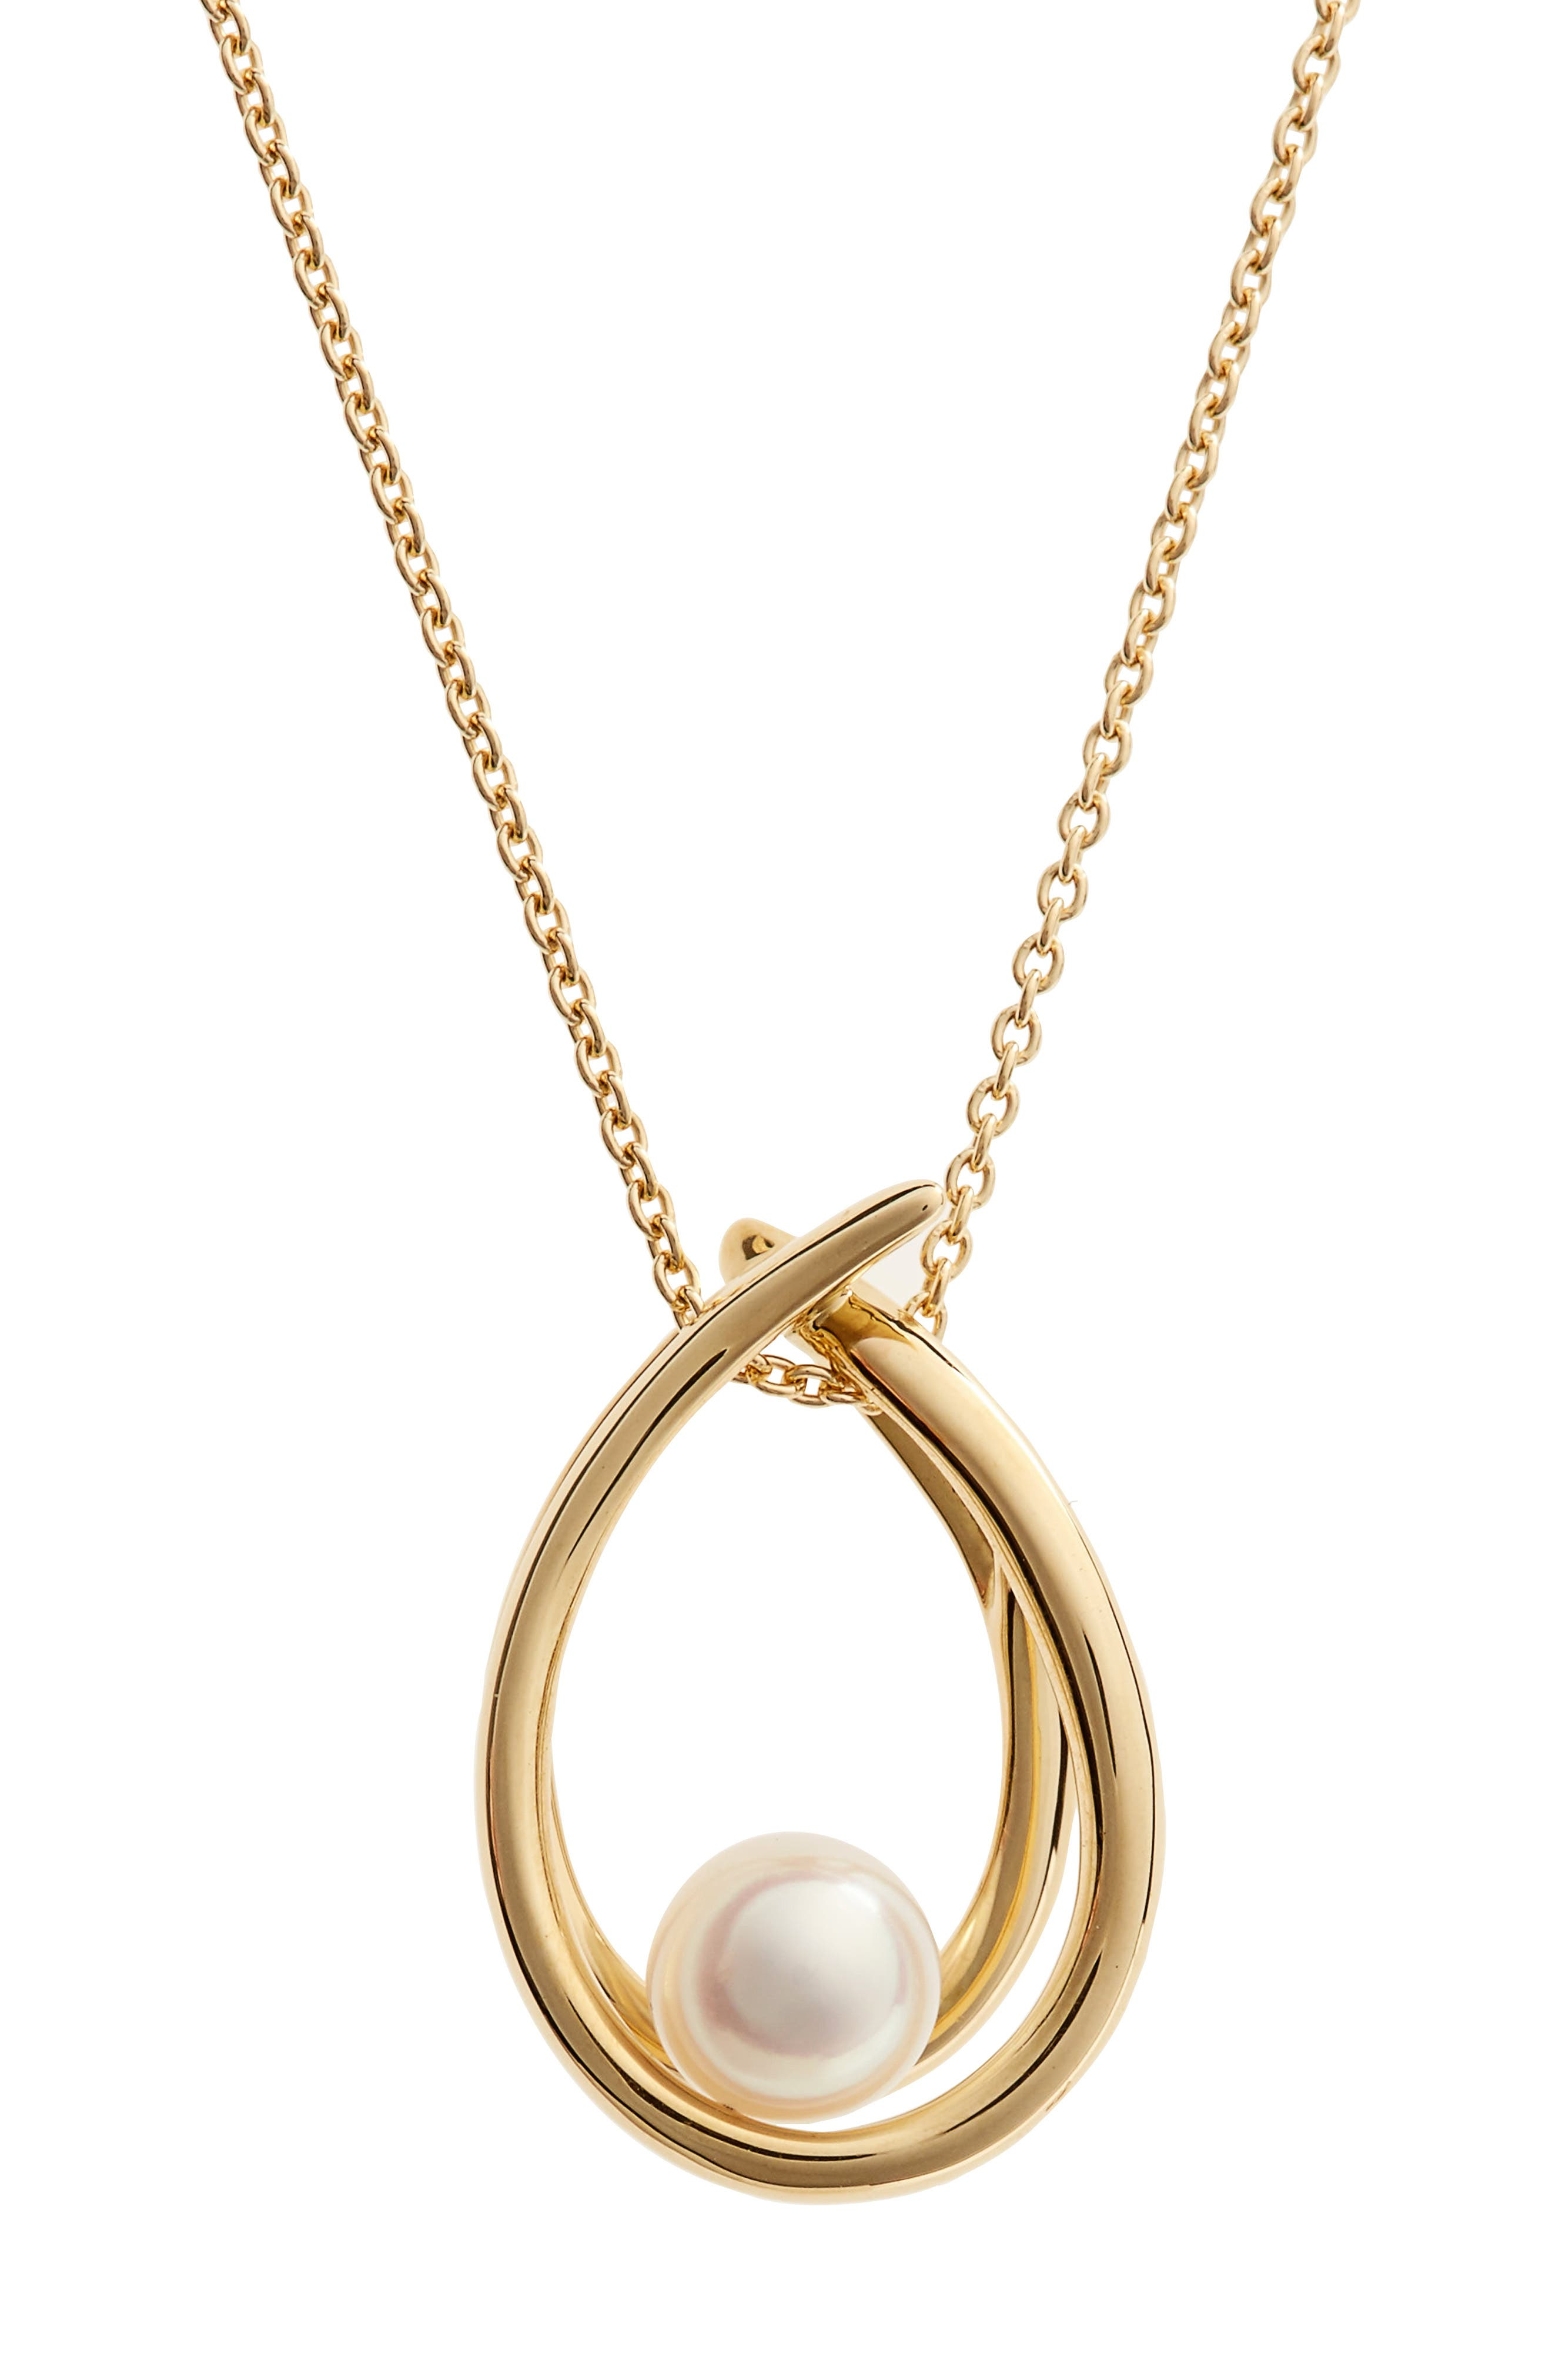 Mikimoto Akoya Pearl Pendant Necklace